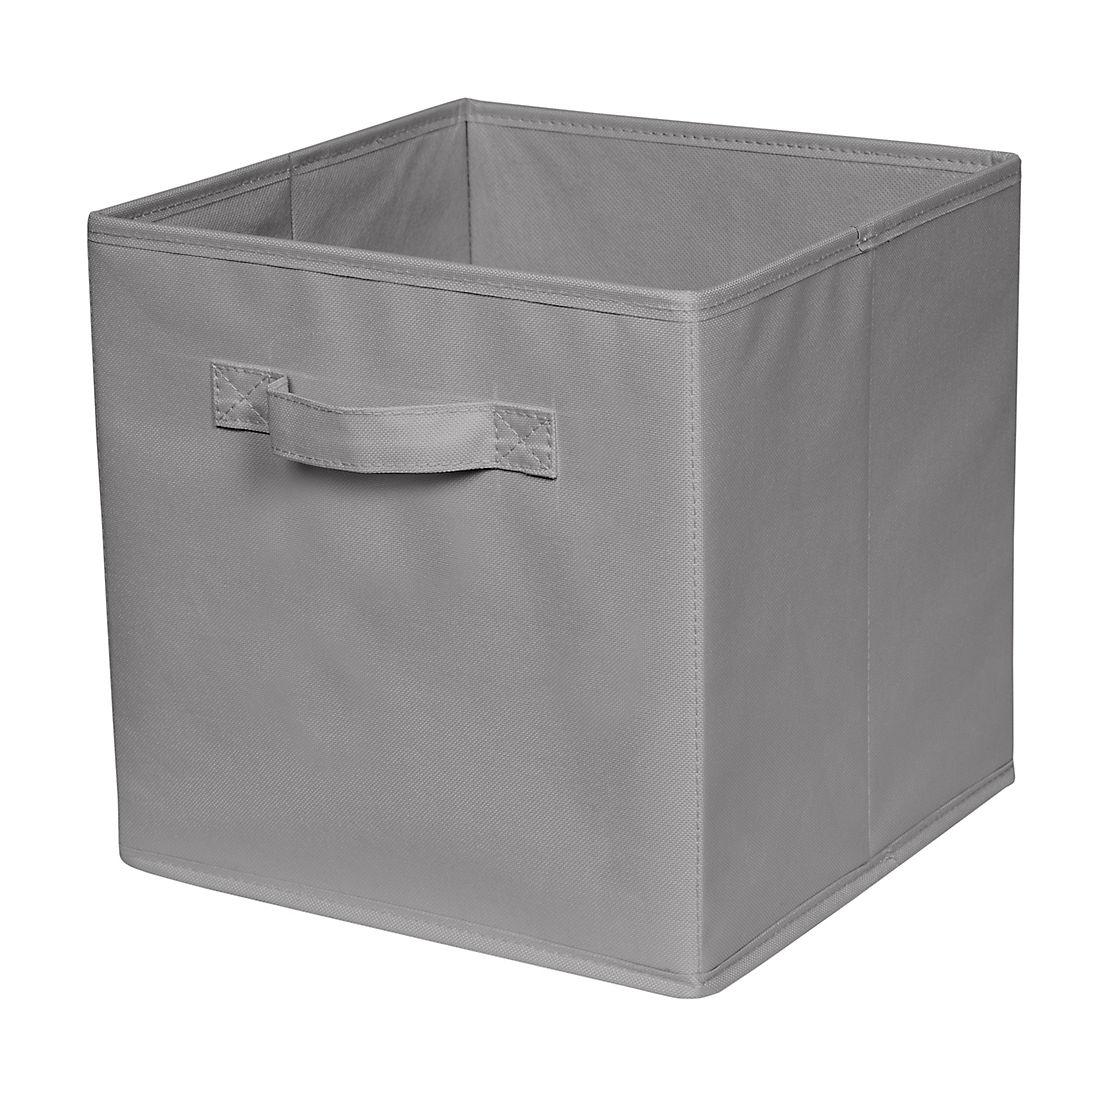 Honey-Can-Do 3-Pc. Explore + Store Kids Toy Storage Bin Set - Gray